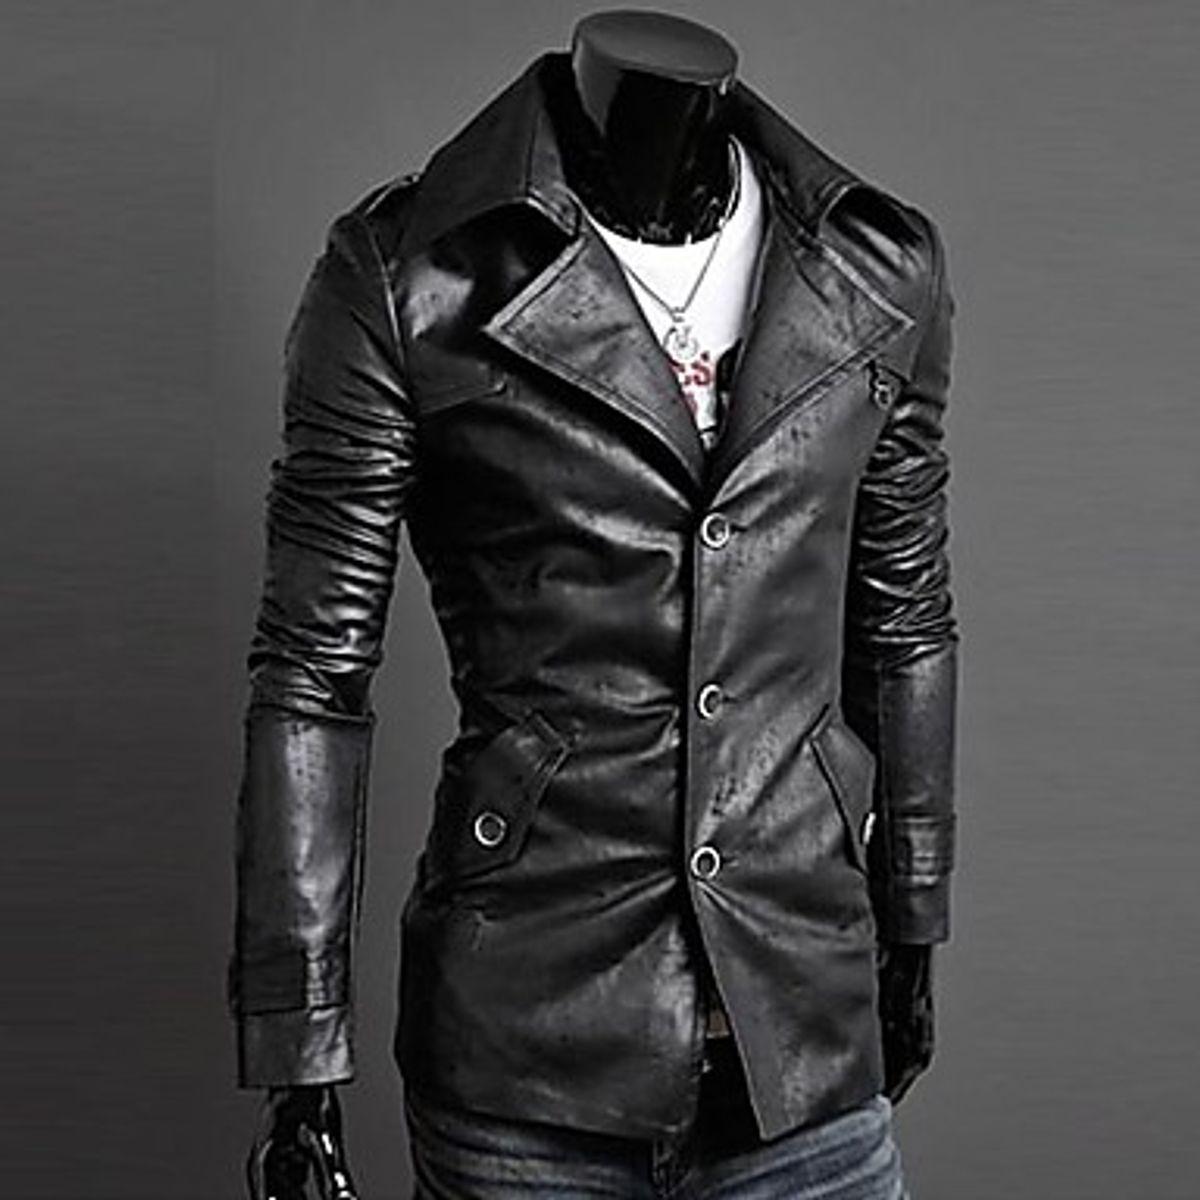 Italiano TUCCI Vintage Slim Fit Padding Style Designer Mens Semi Leather Jacket Black P01